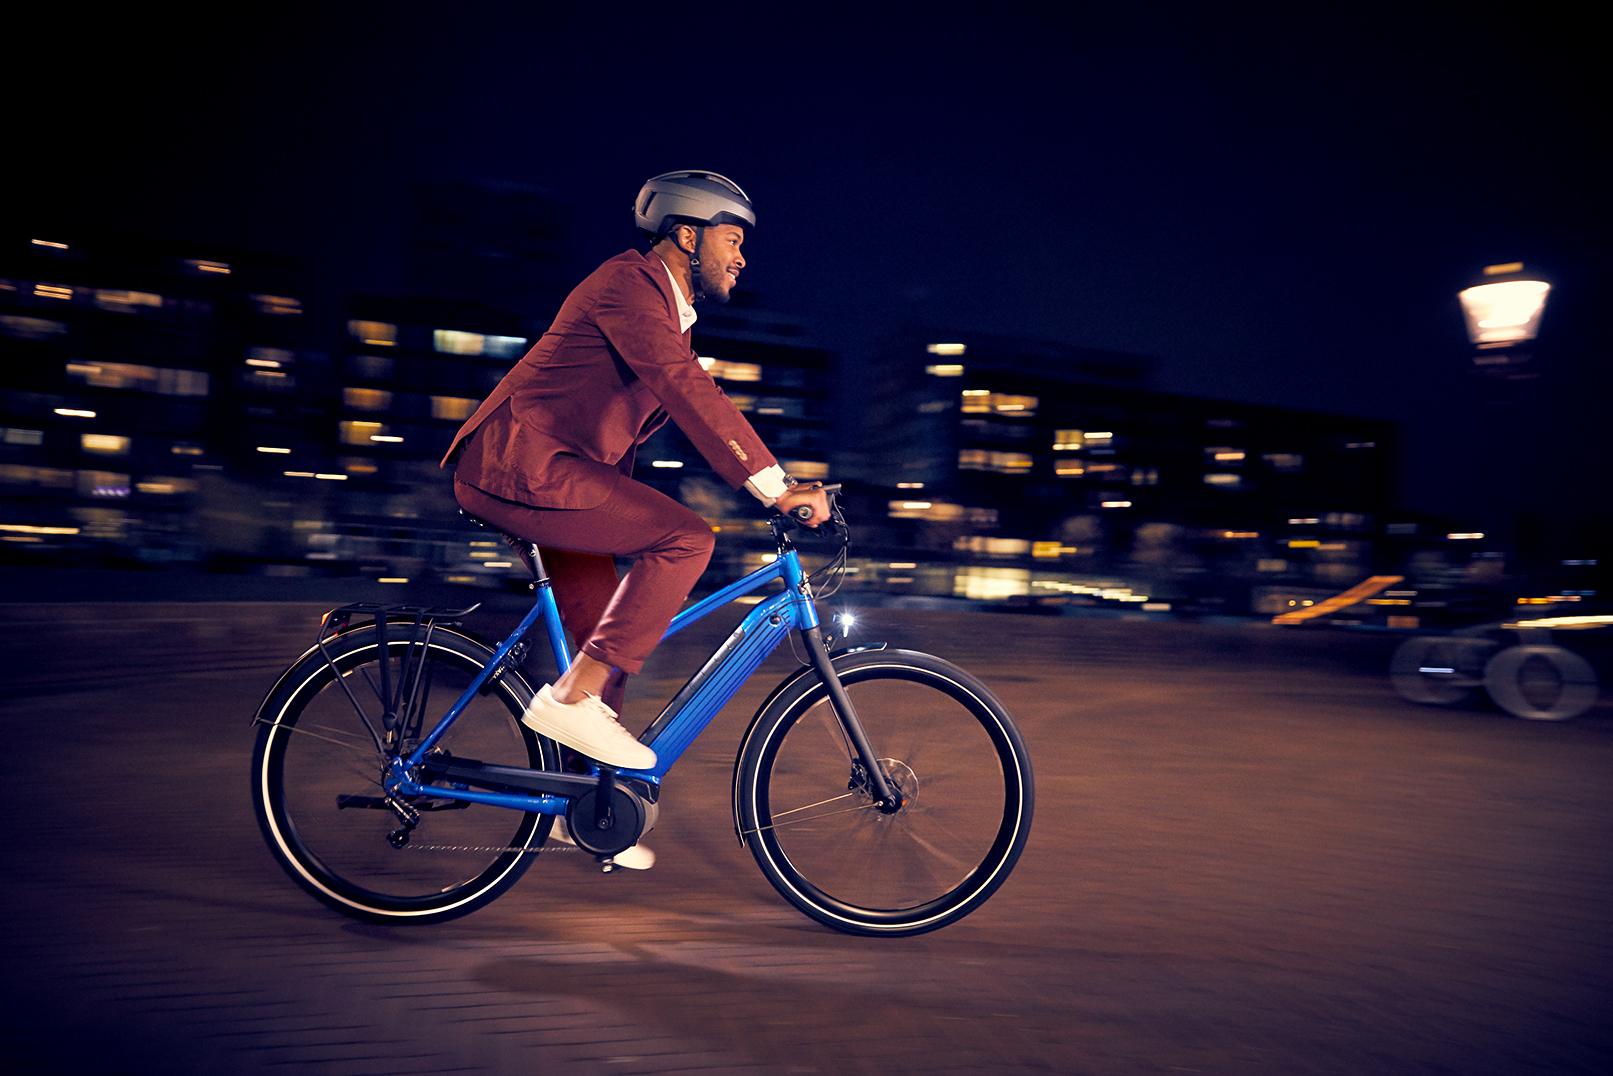 Mand om aftenen på cykel | Cykellygter